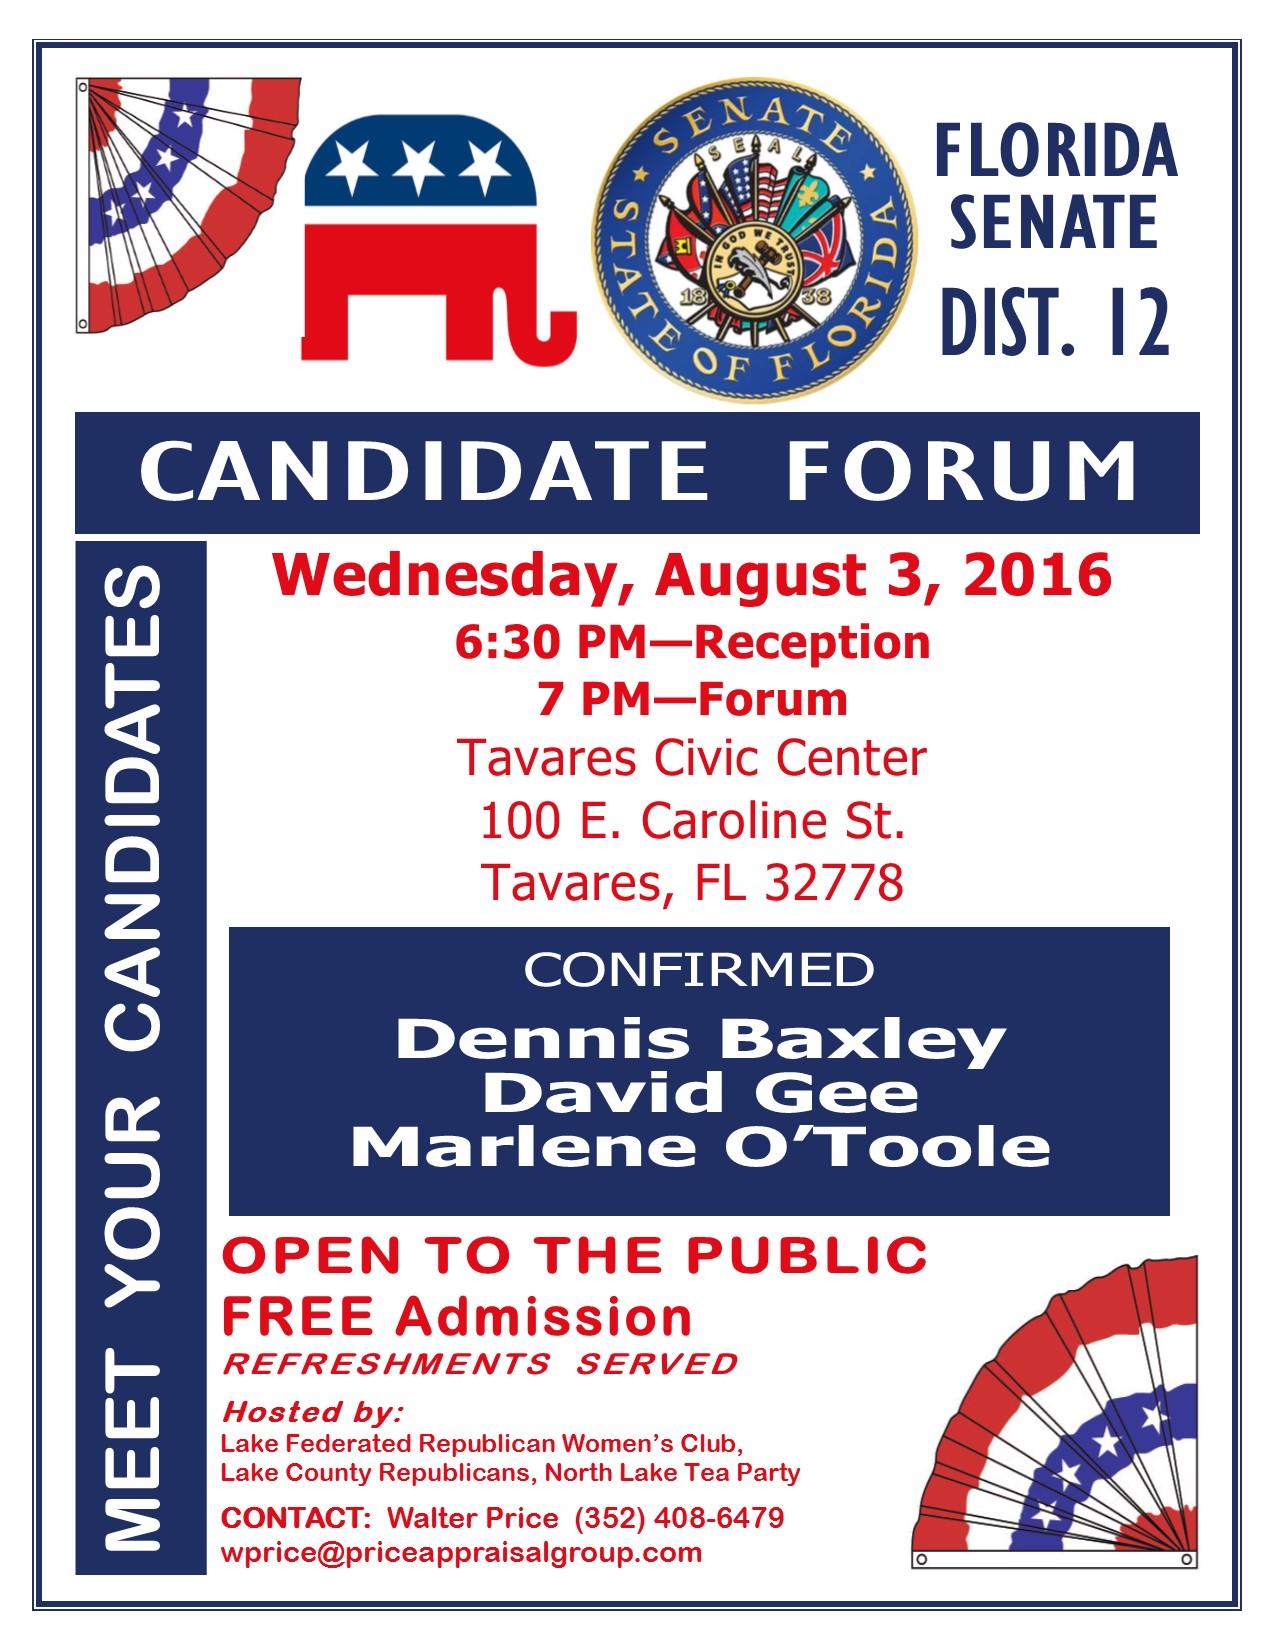 FL_Senate_Dist_12_Candidate_Forum_20160803.jpg